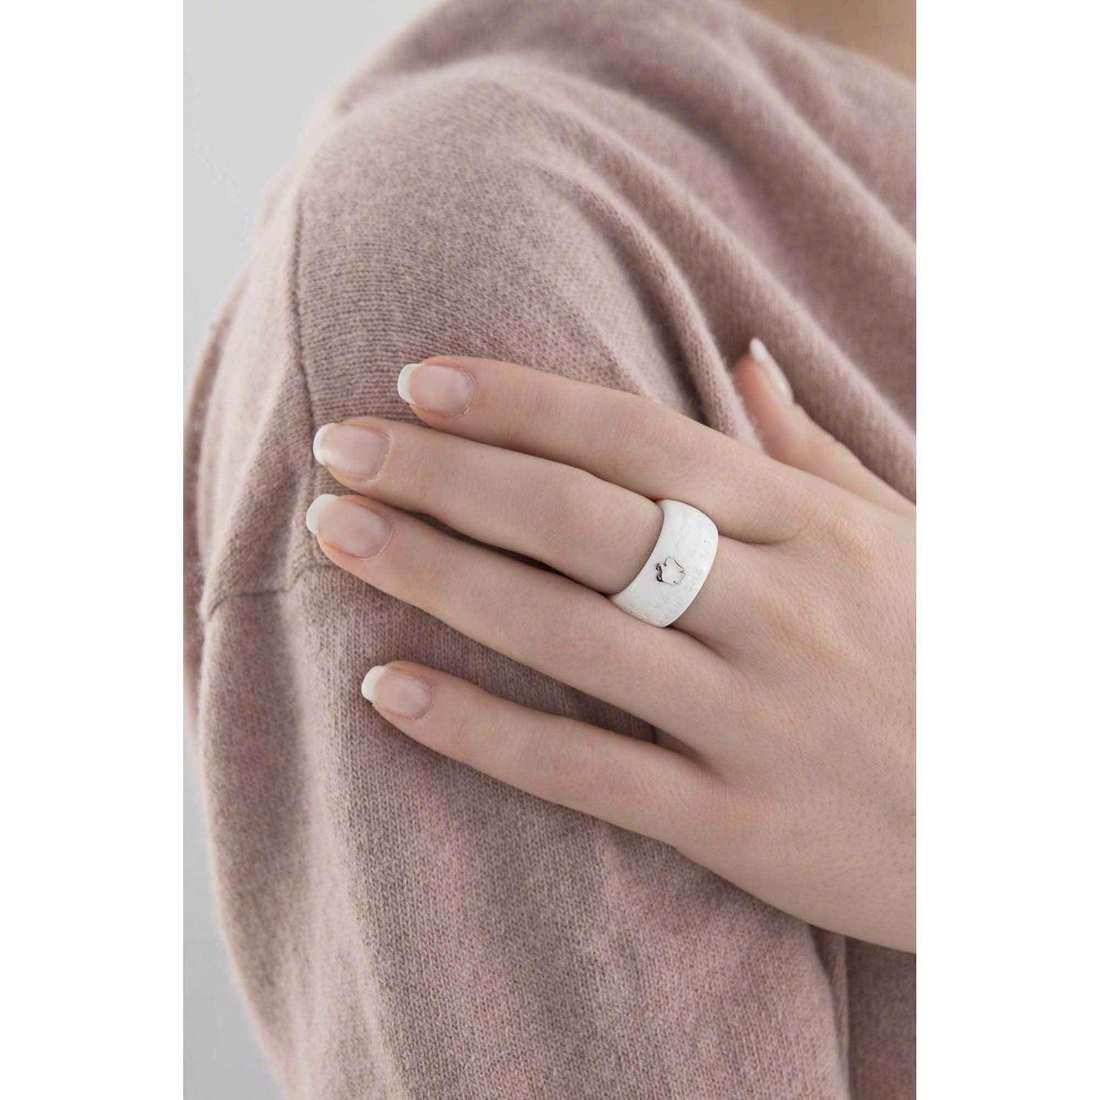 Giannotti rings Chiama Angeli woman REB-14 indosso